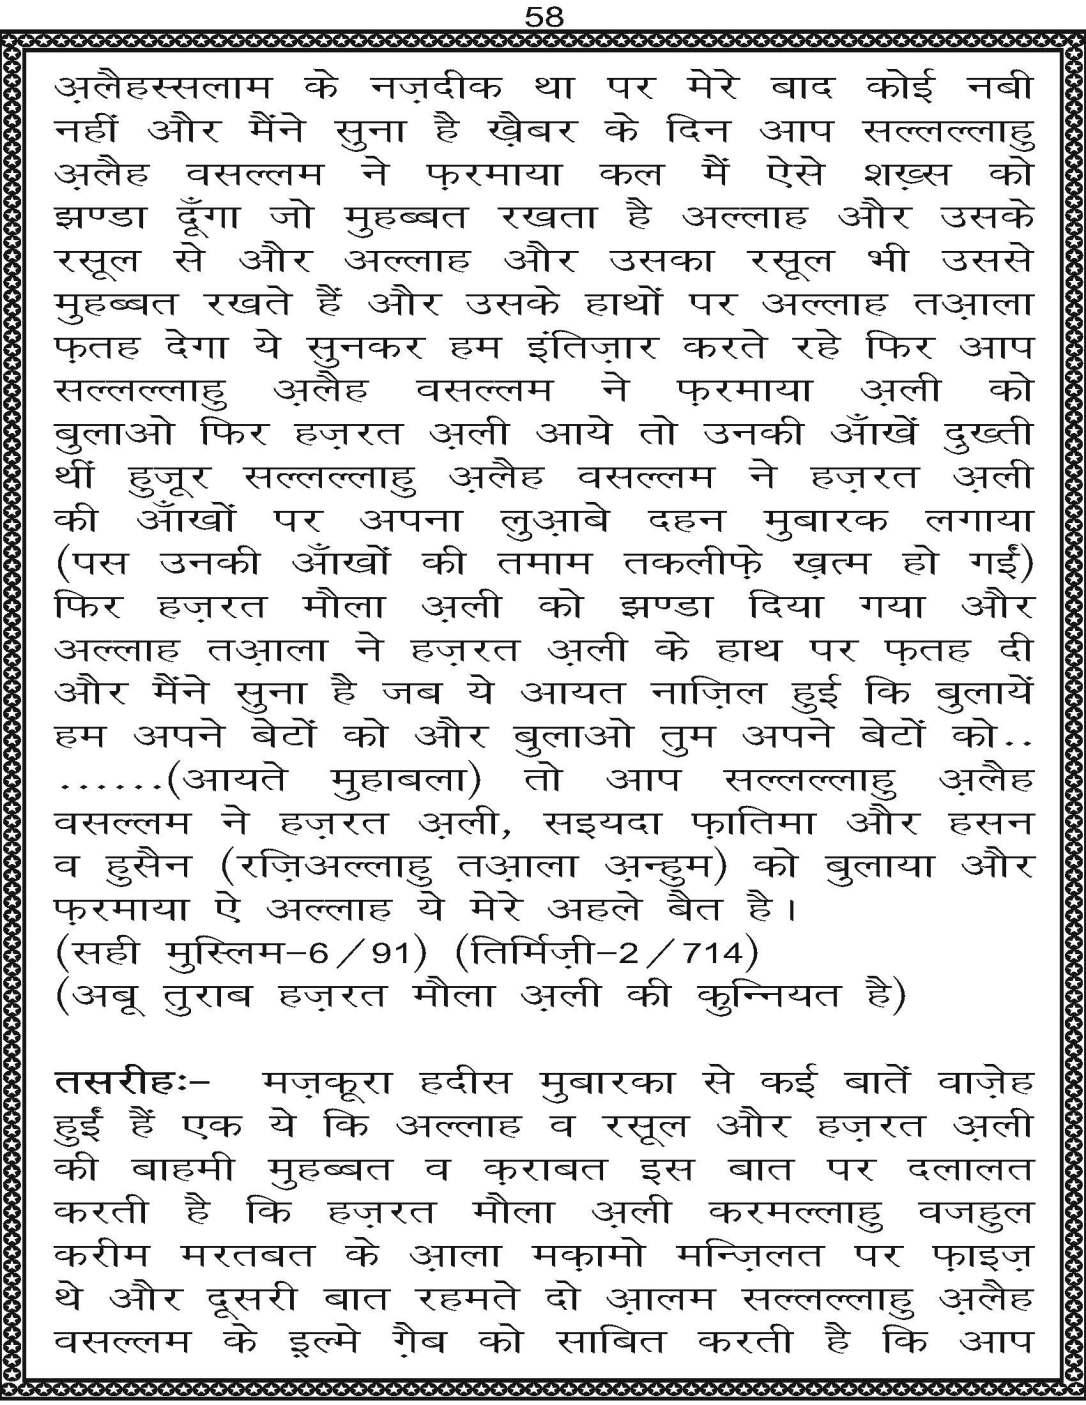 AzmateTaziyadari_Page_058